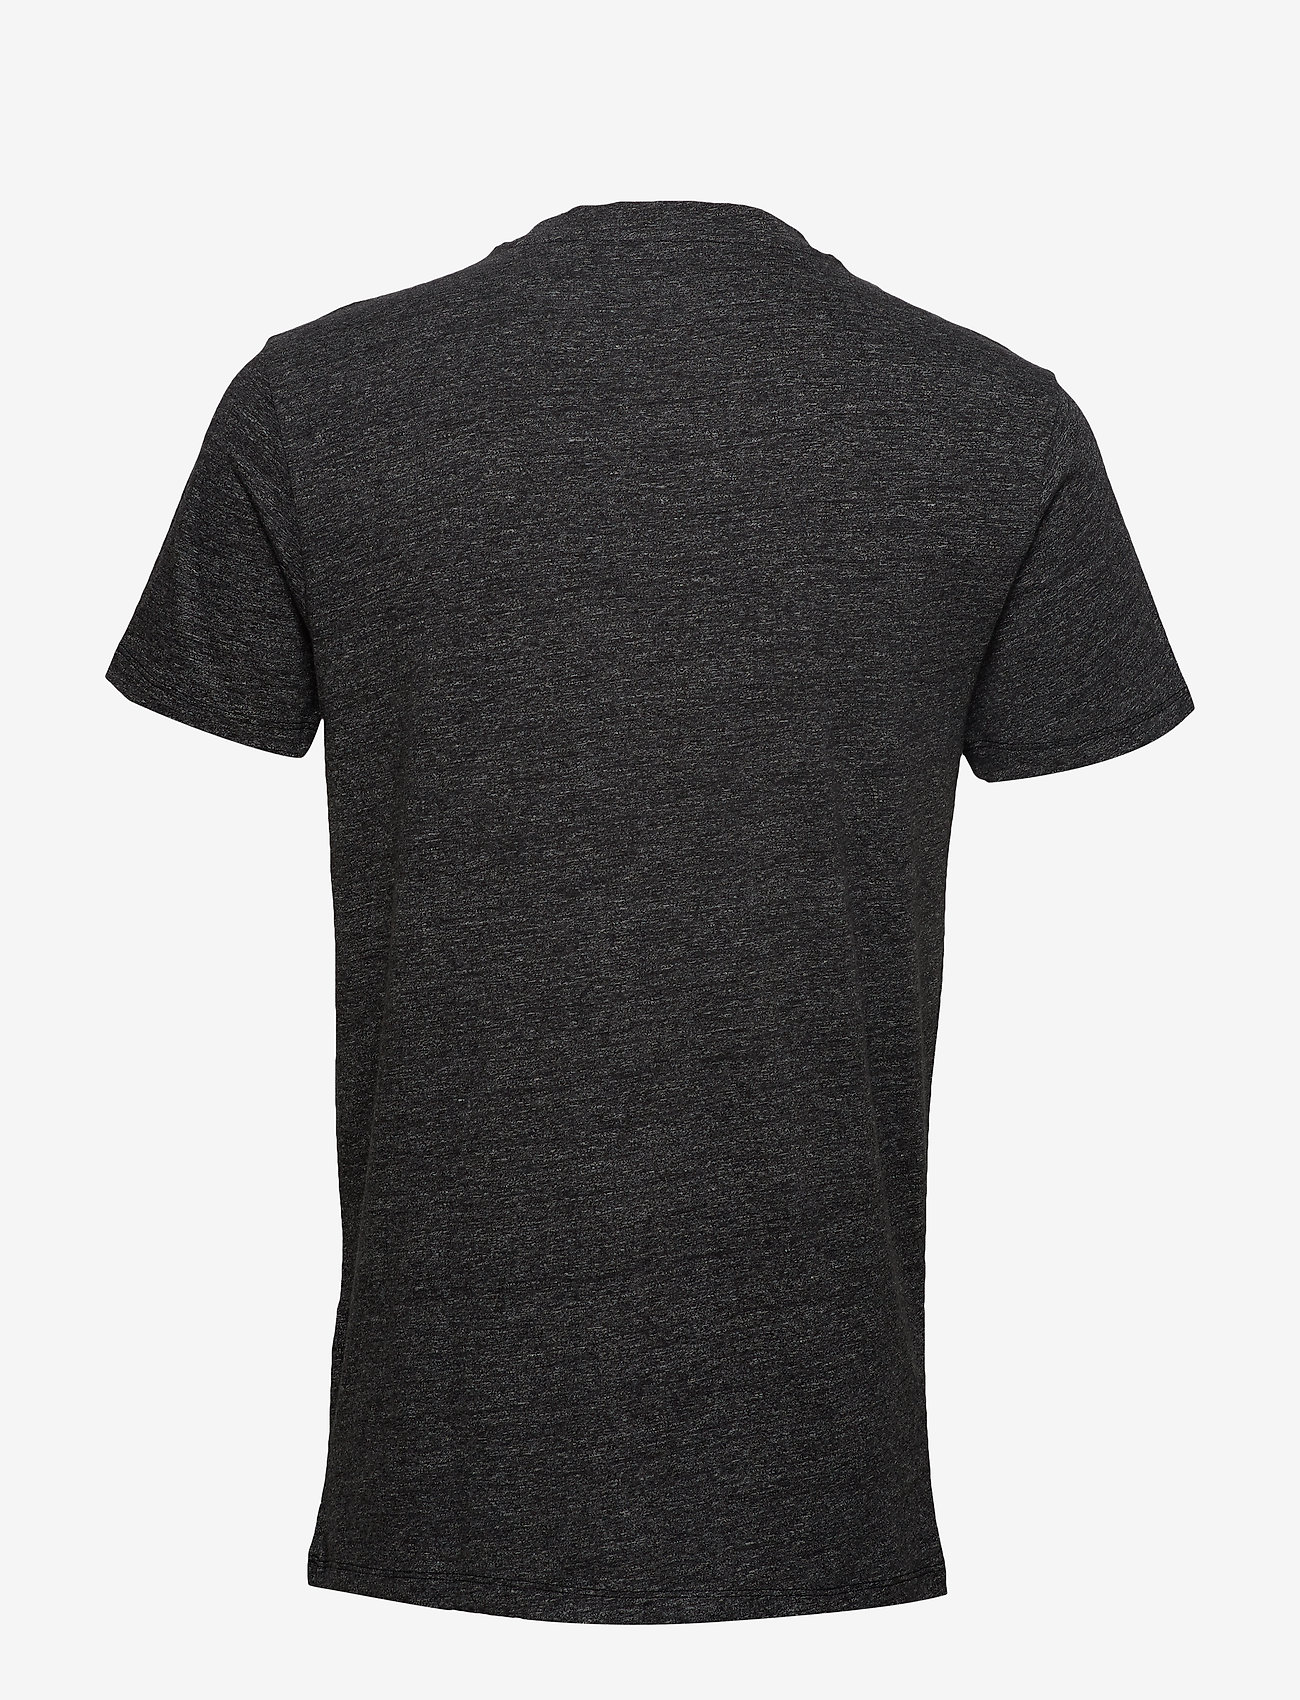 Lee Jeans - ULTIMATE POCKET TEE - basic t-shirts - dark grey mele - 1